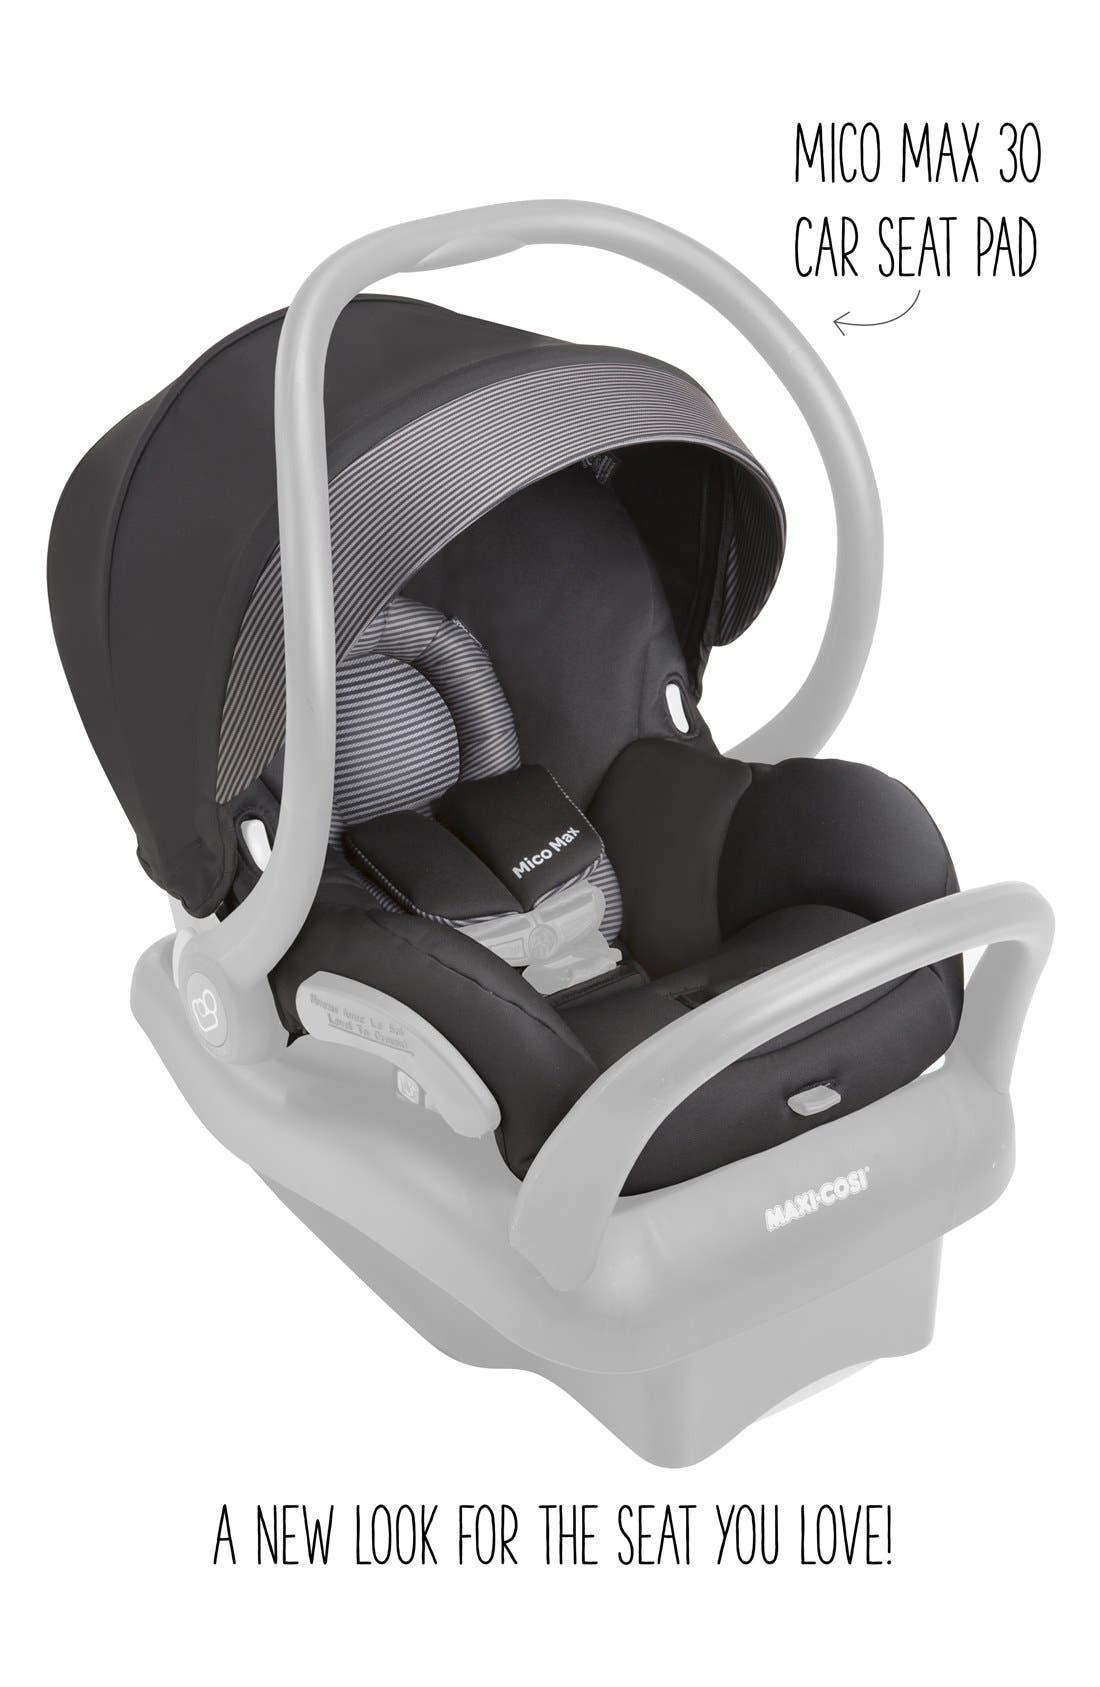 Seat Pad Fashion Kit for Mico Max 30 Car Seat,                             Alternate thumbnail 2, color,                             Devoted Black